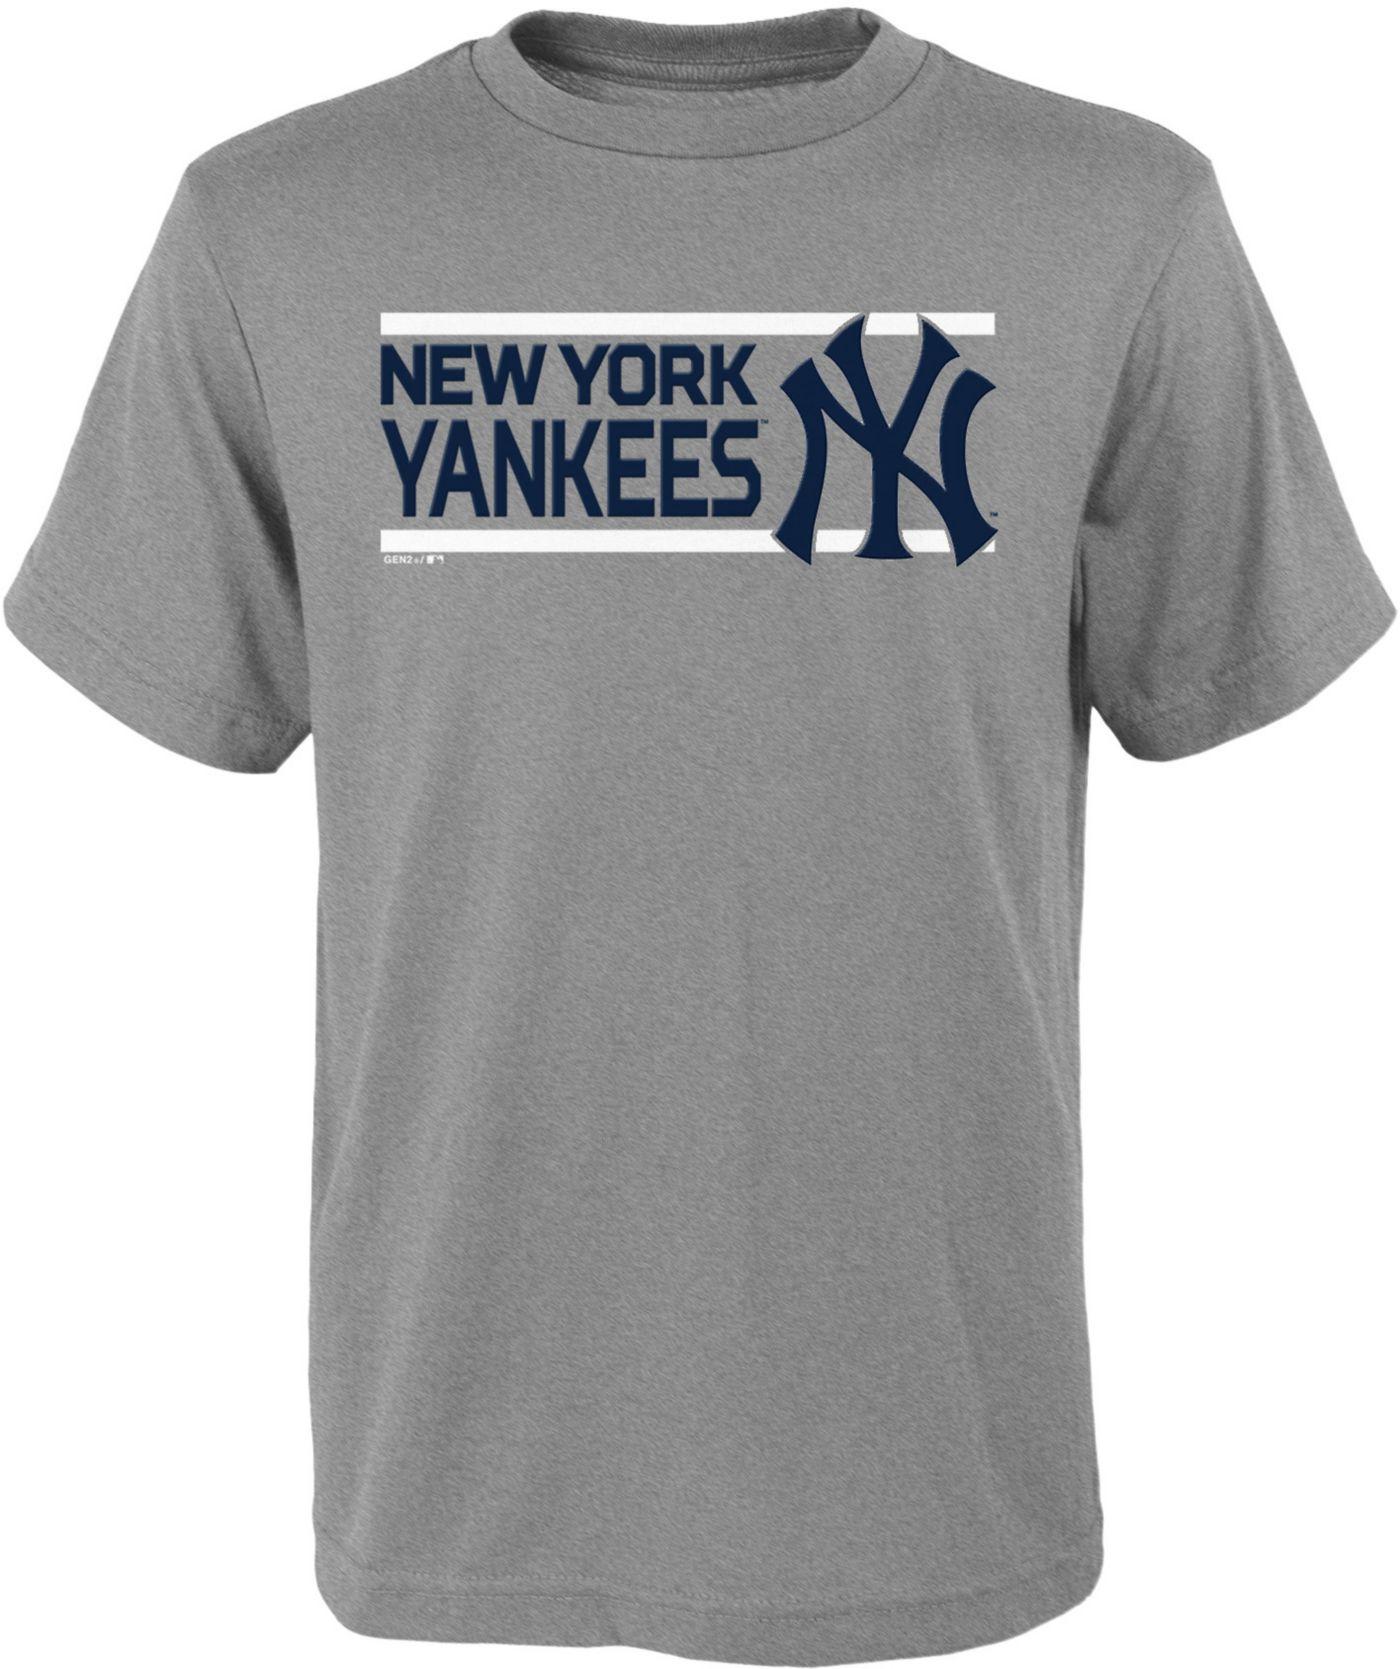 Gen2 Youth New York Yankees Dri-Tek Grey T-Shirt